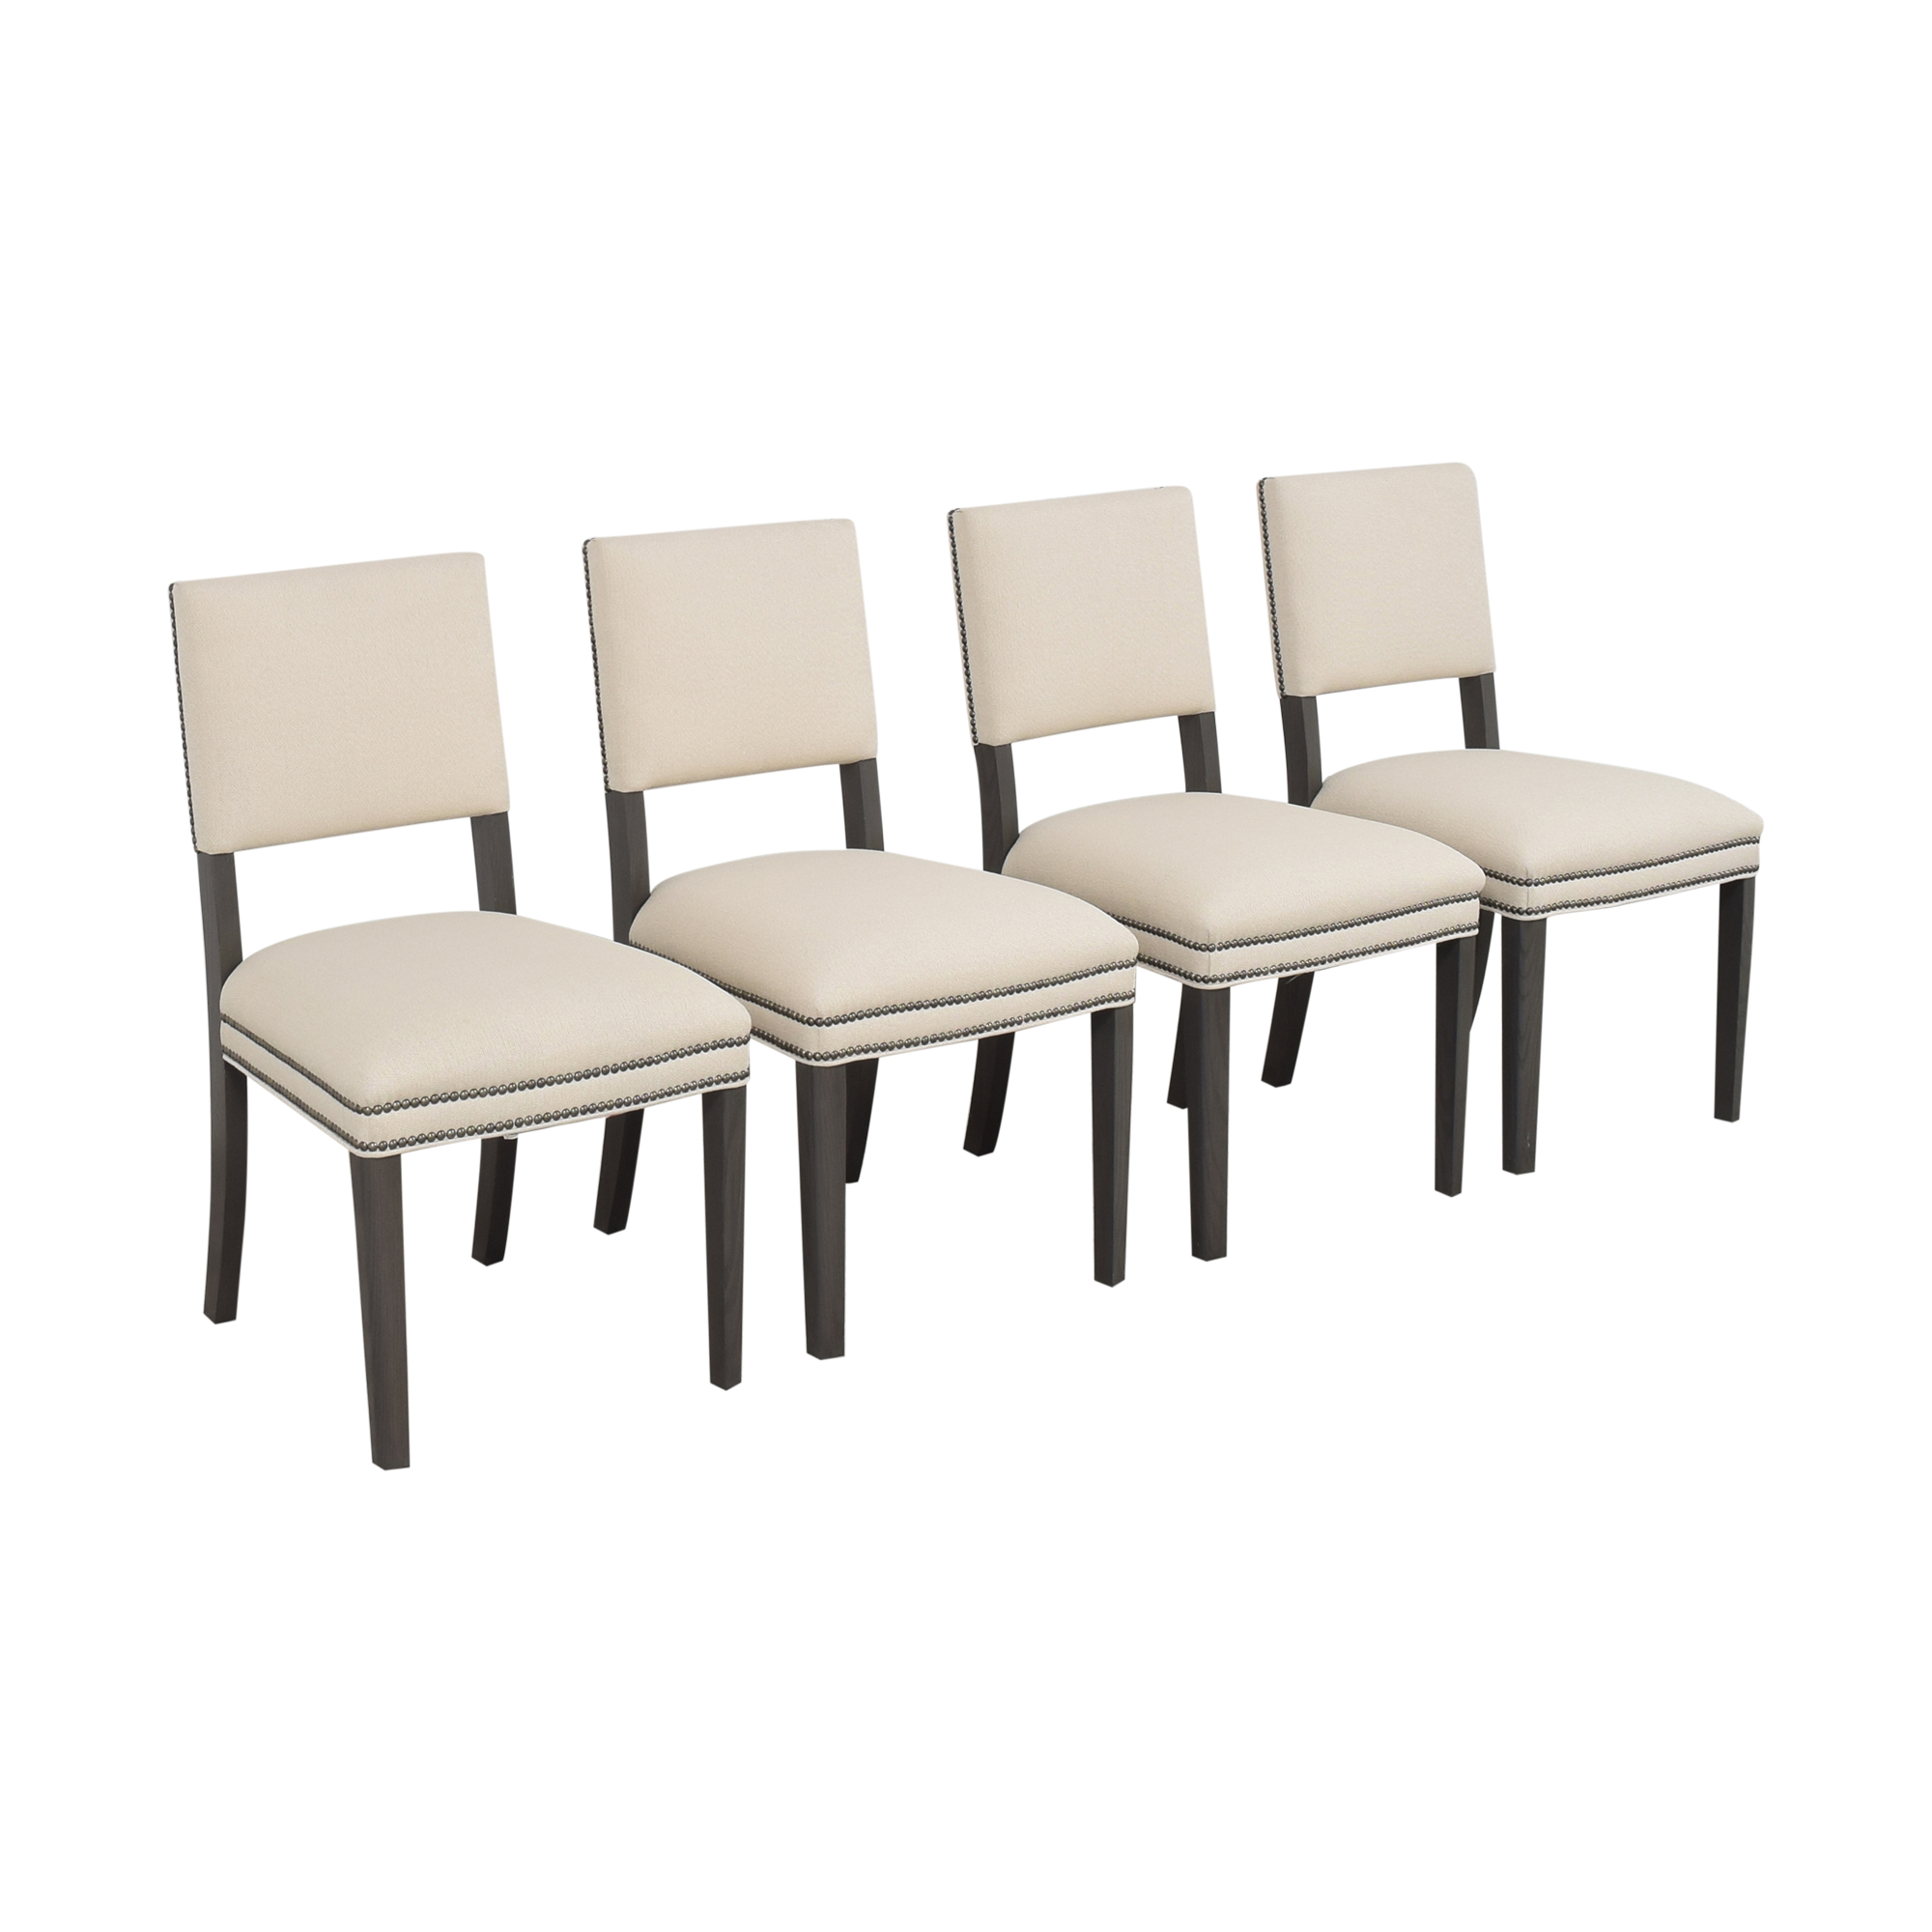 Vanguard Furniture Vanguard Furniture Newton Stocked Dining Chairs on sale